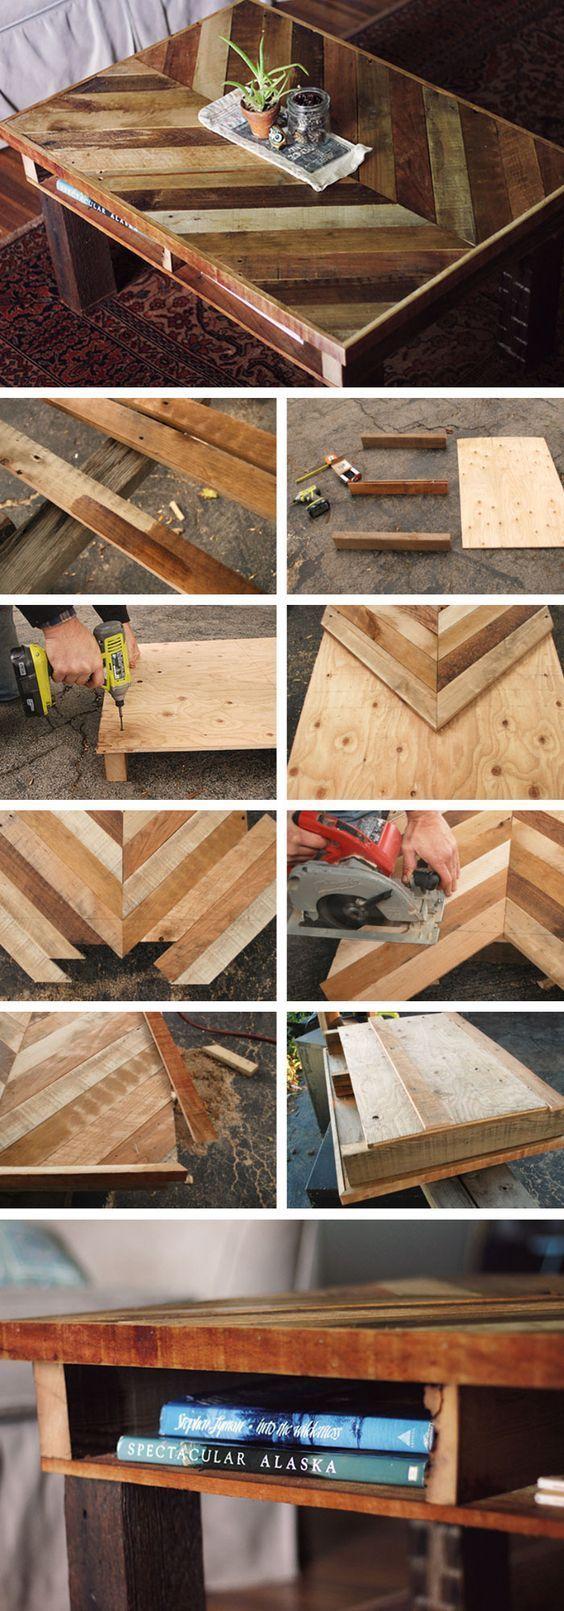 Diy Furniture : DIY Pallet Coffee Table | DIY Home Decor Ideas on a Budget | DIY Home Decorating